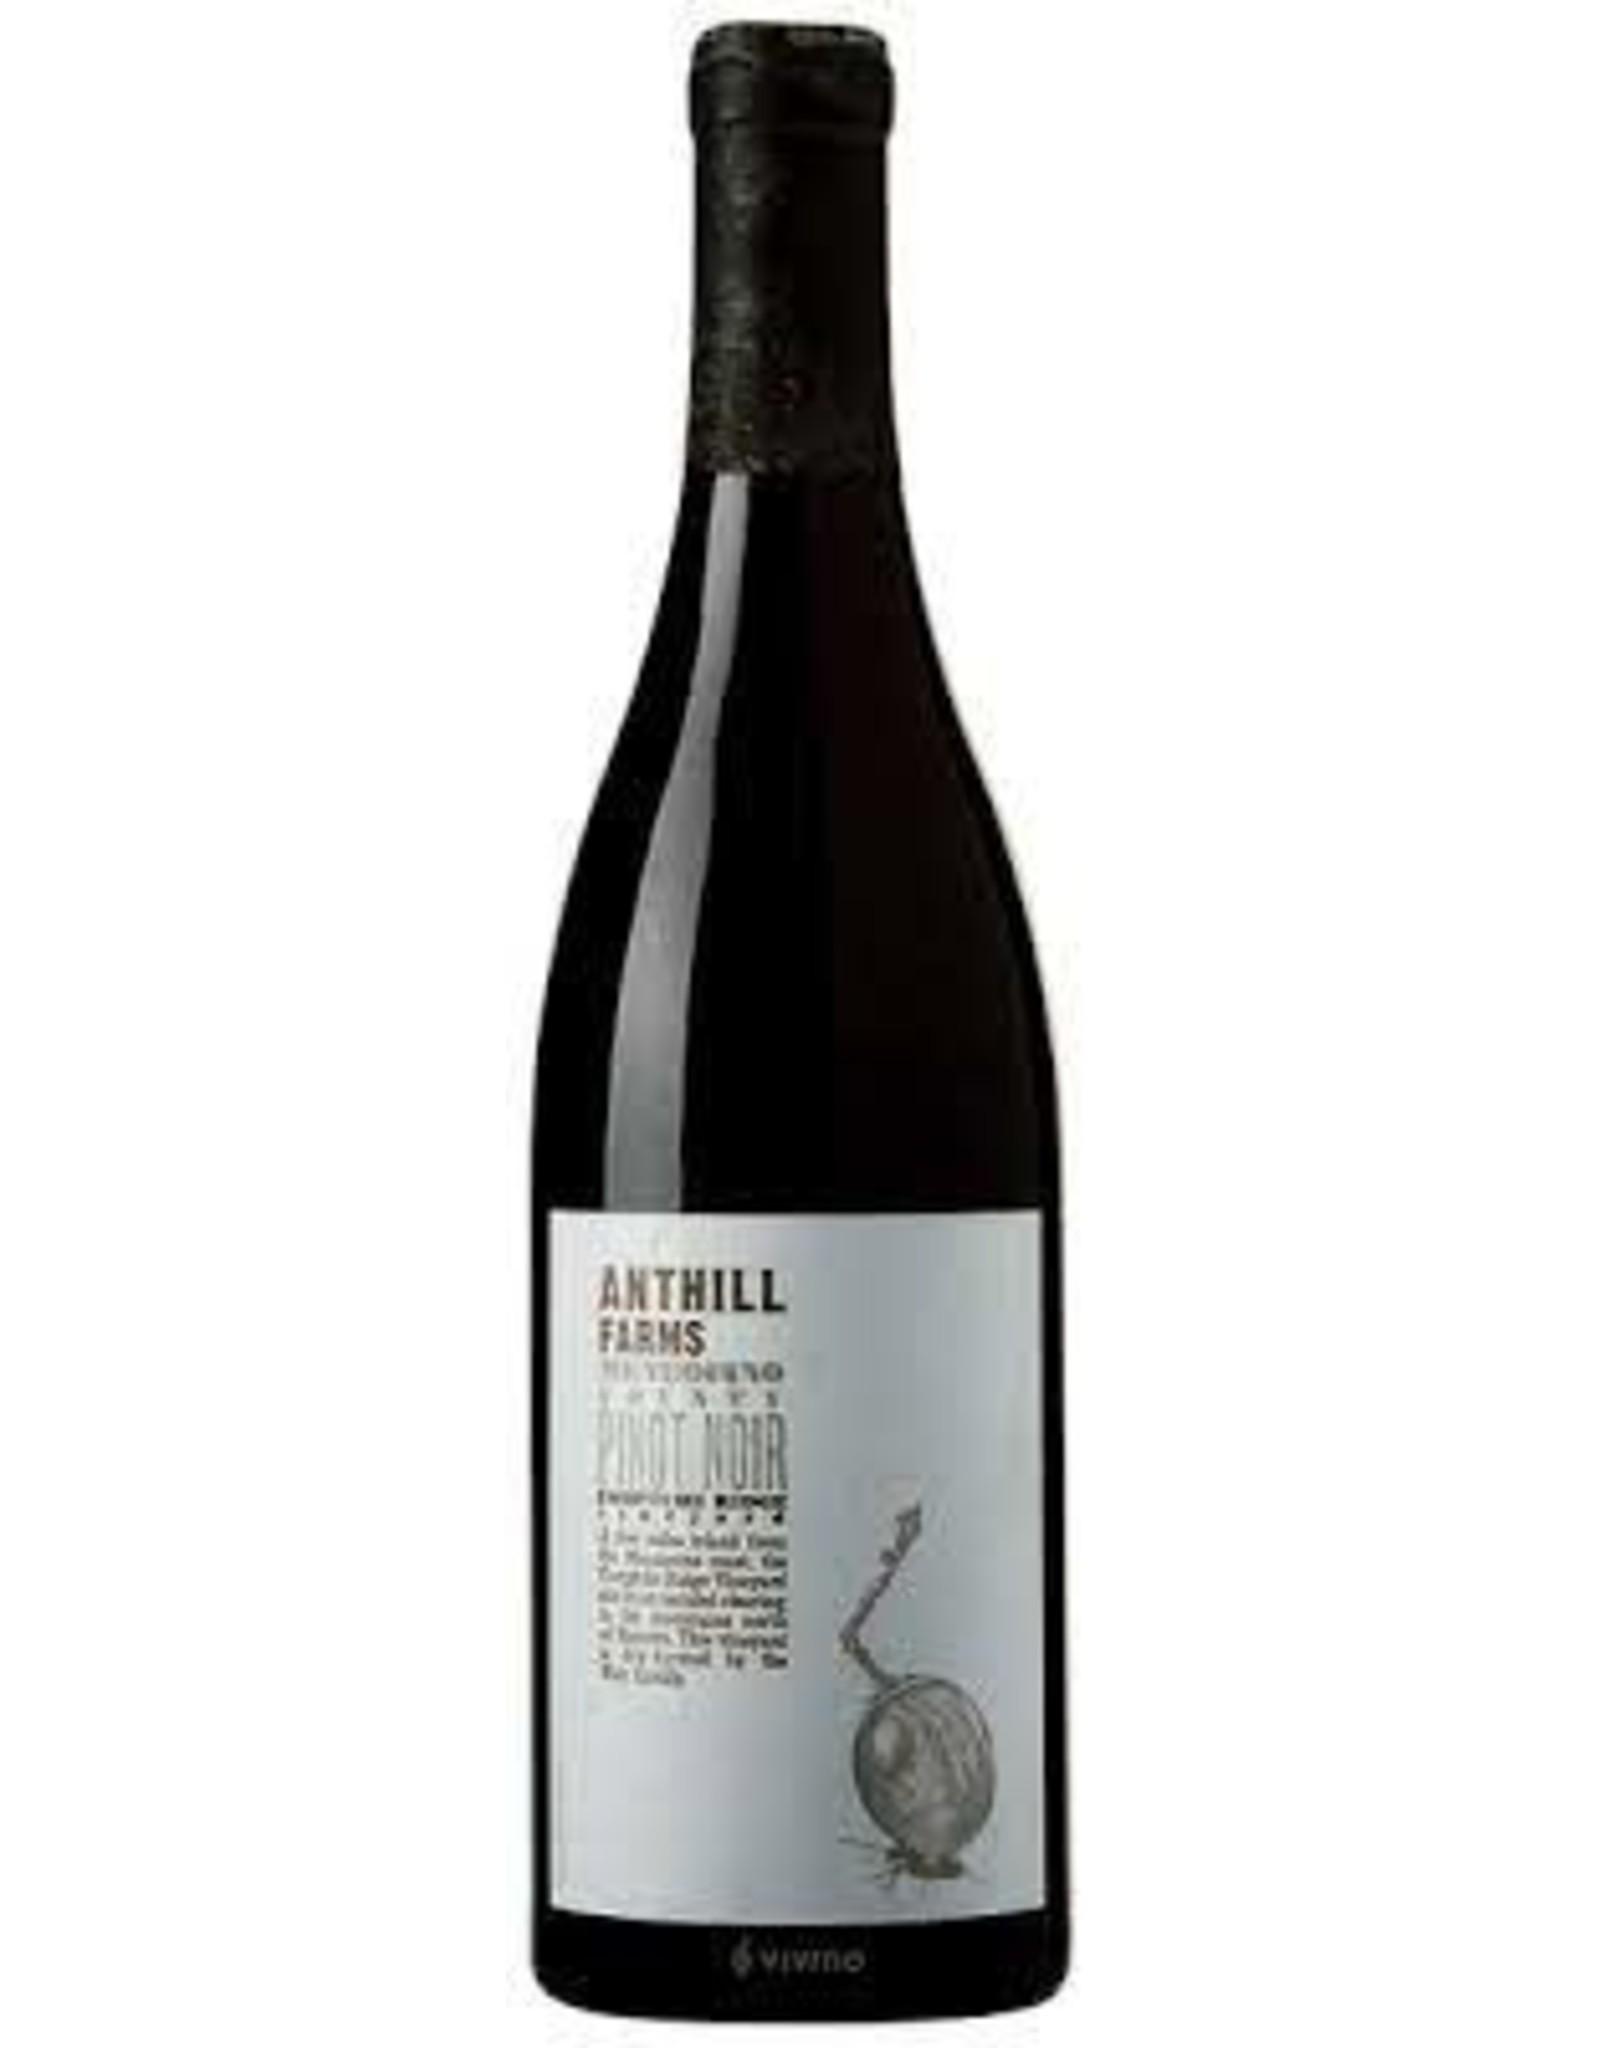 Anthill Farms Anthill Farms Pinot Noir, Comptche Ridge Vineyard, Mendocino 2018